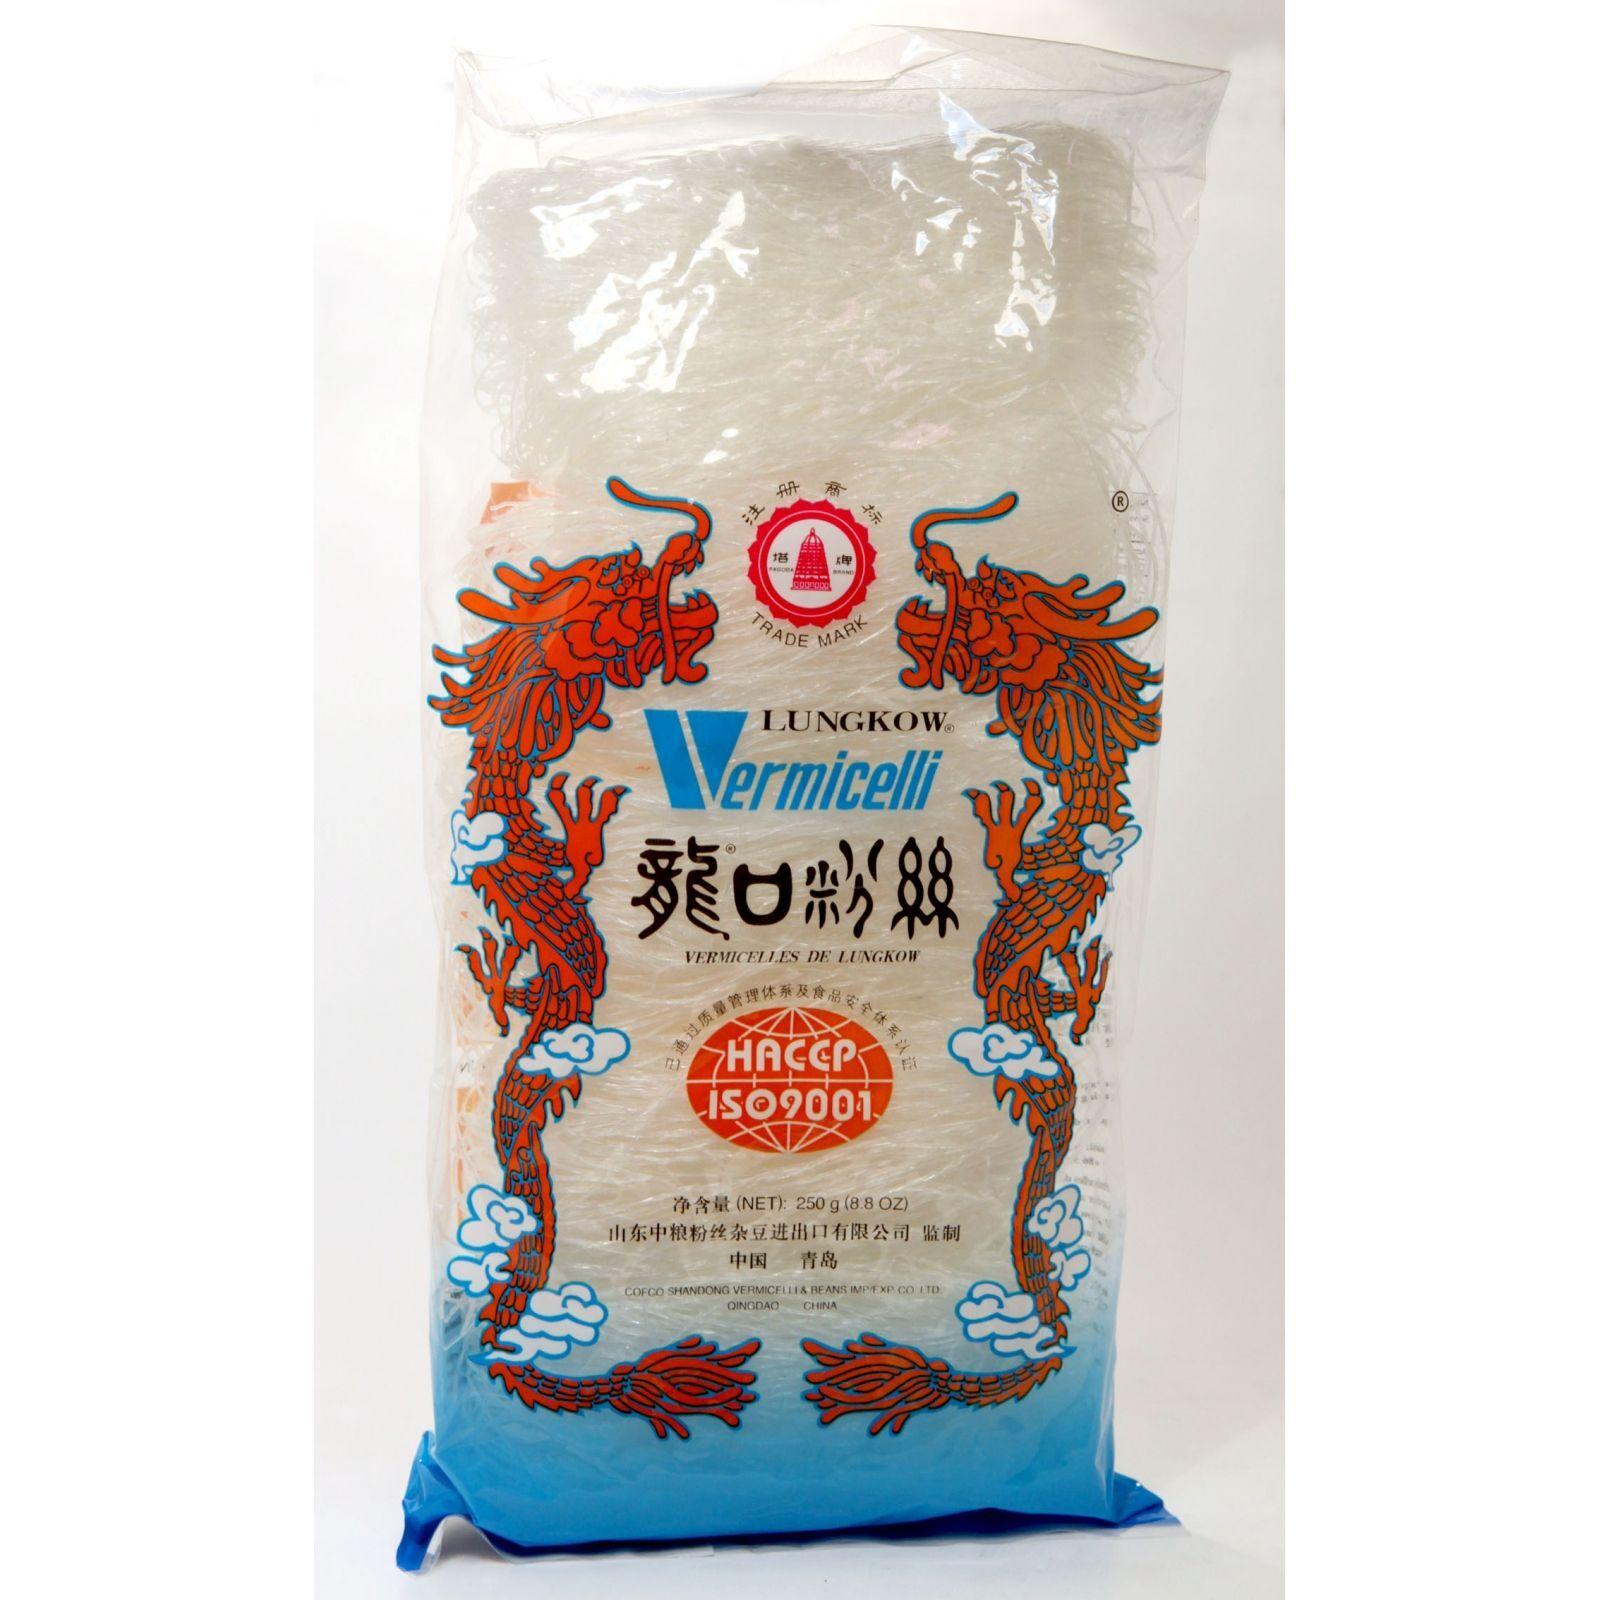 Asia Marché Vermicelles de soja Lungkow 1 Kg